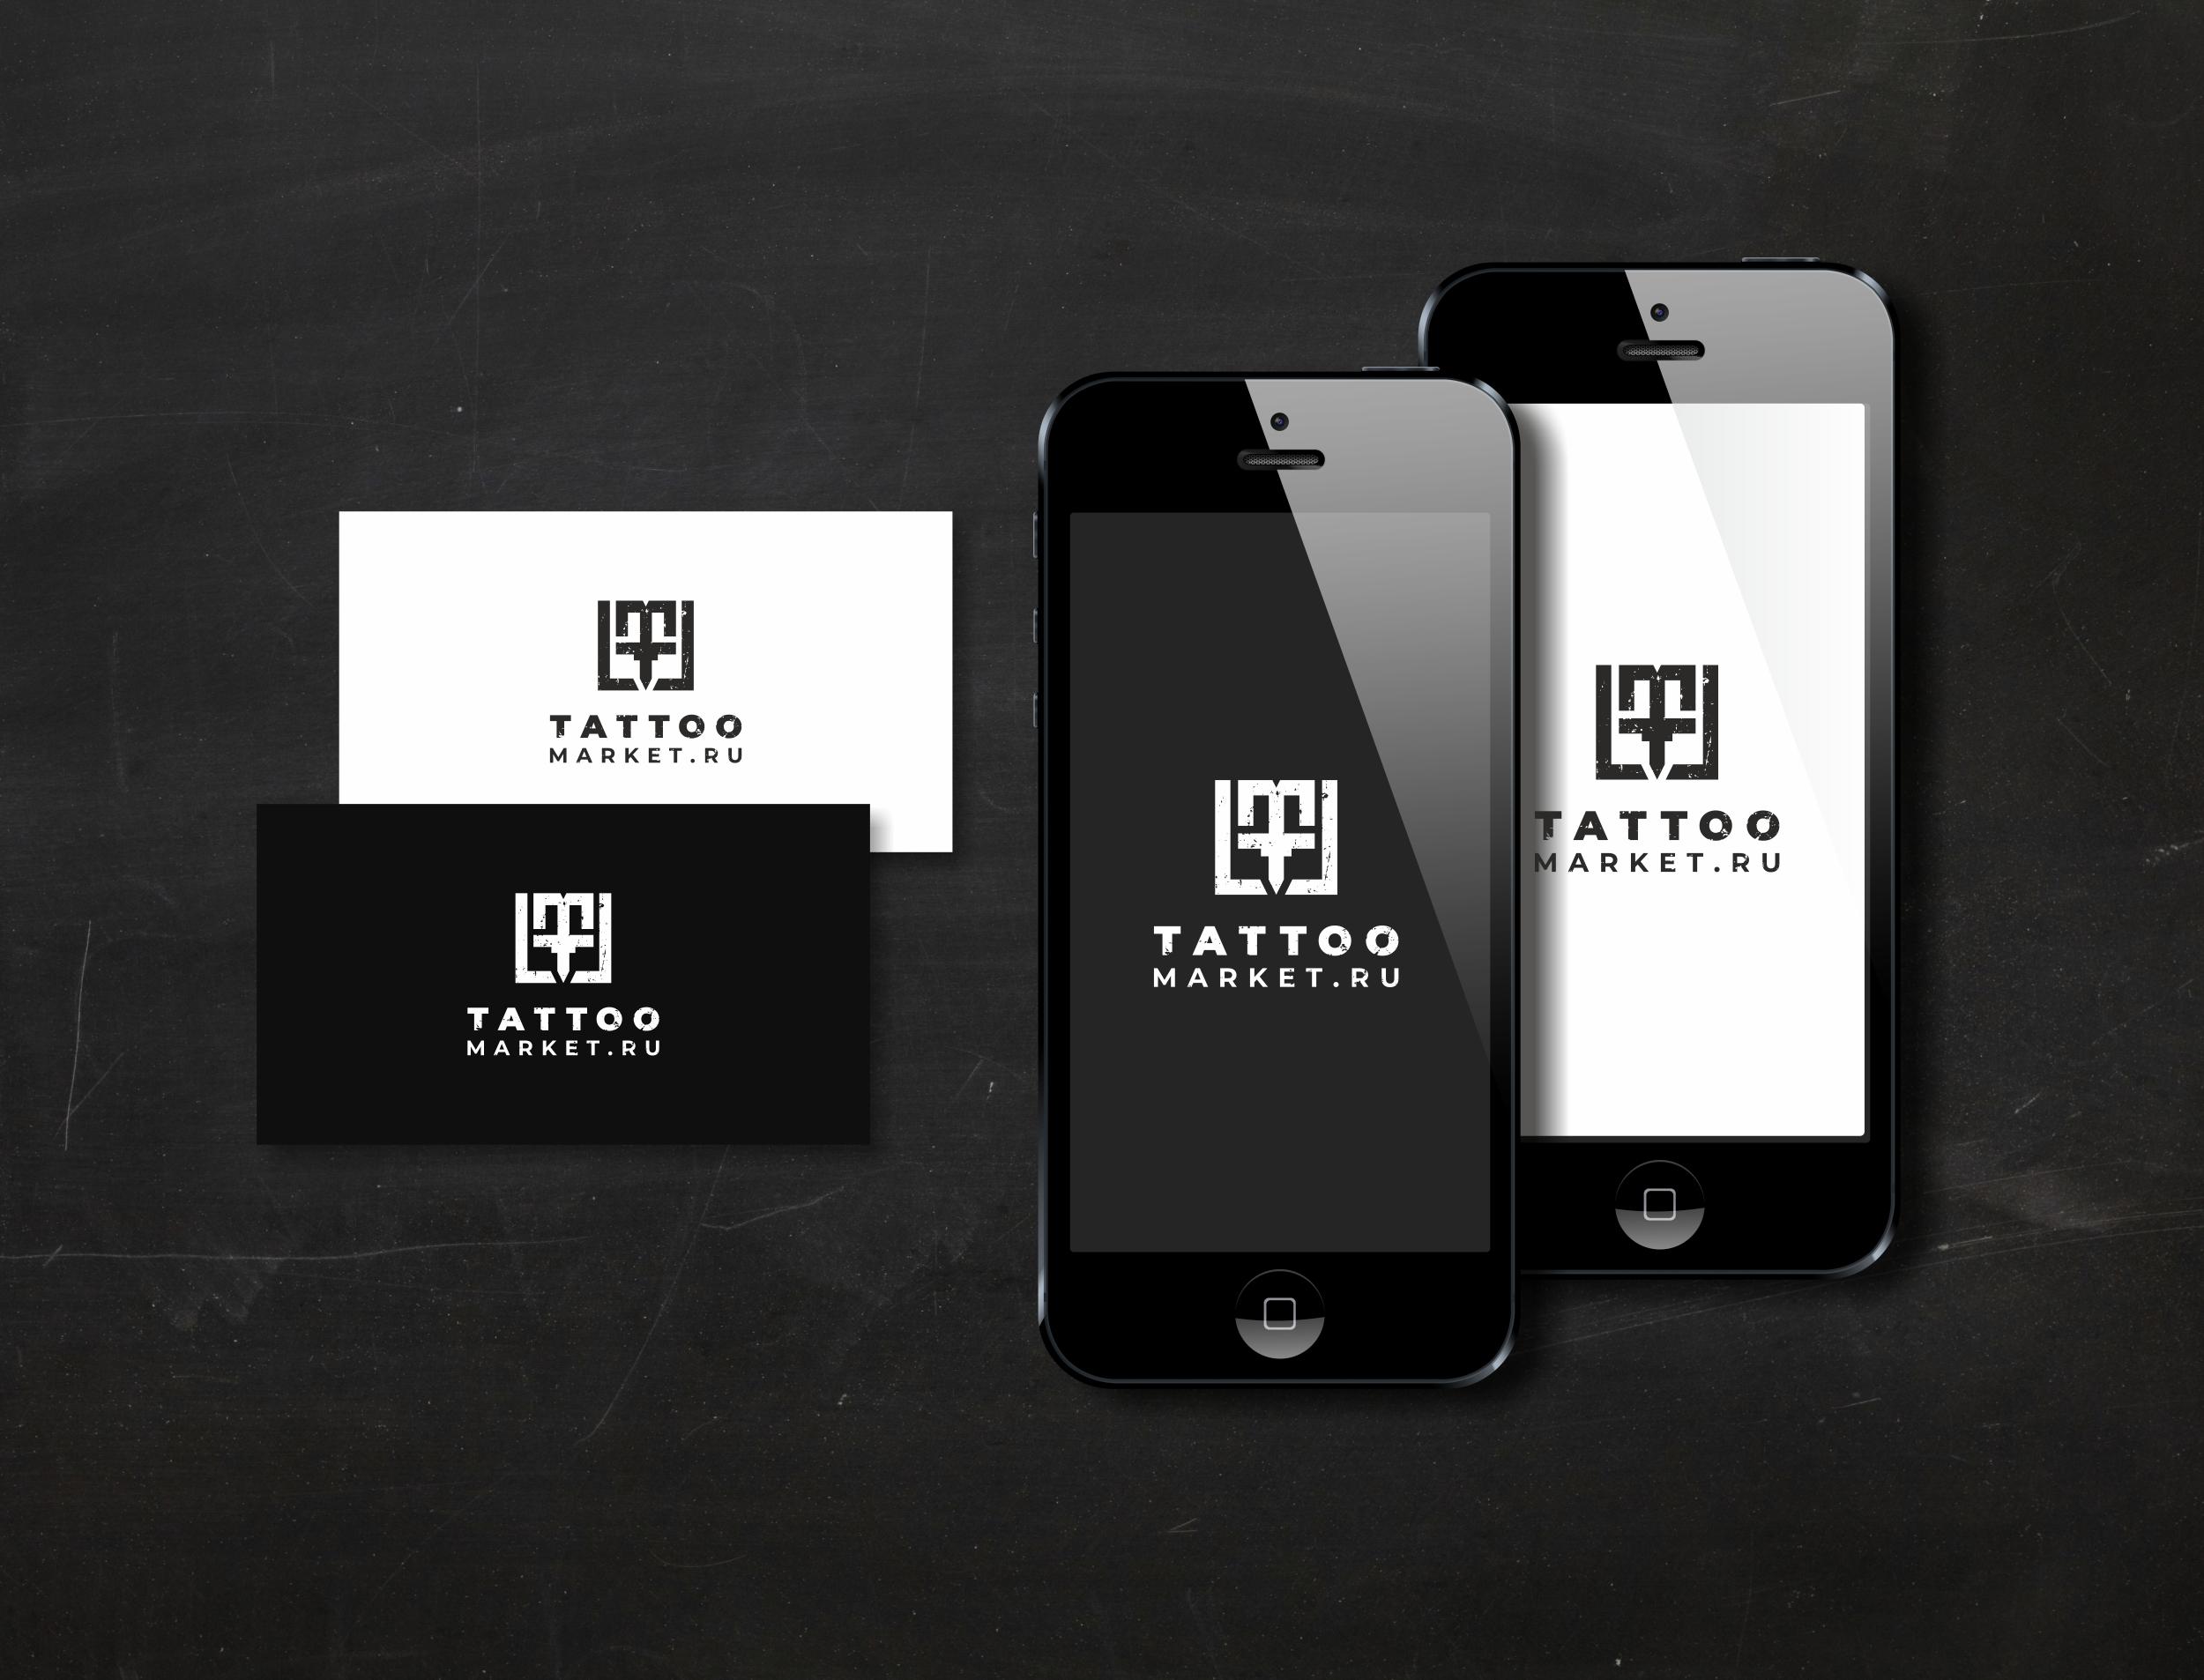 Редизайн логотипа магазина тату оборудования TattooMarket.ru фото f_2165c3cdf6f4a256.jpg